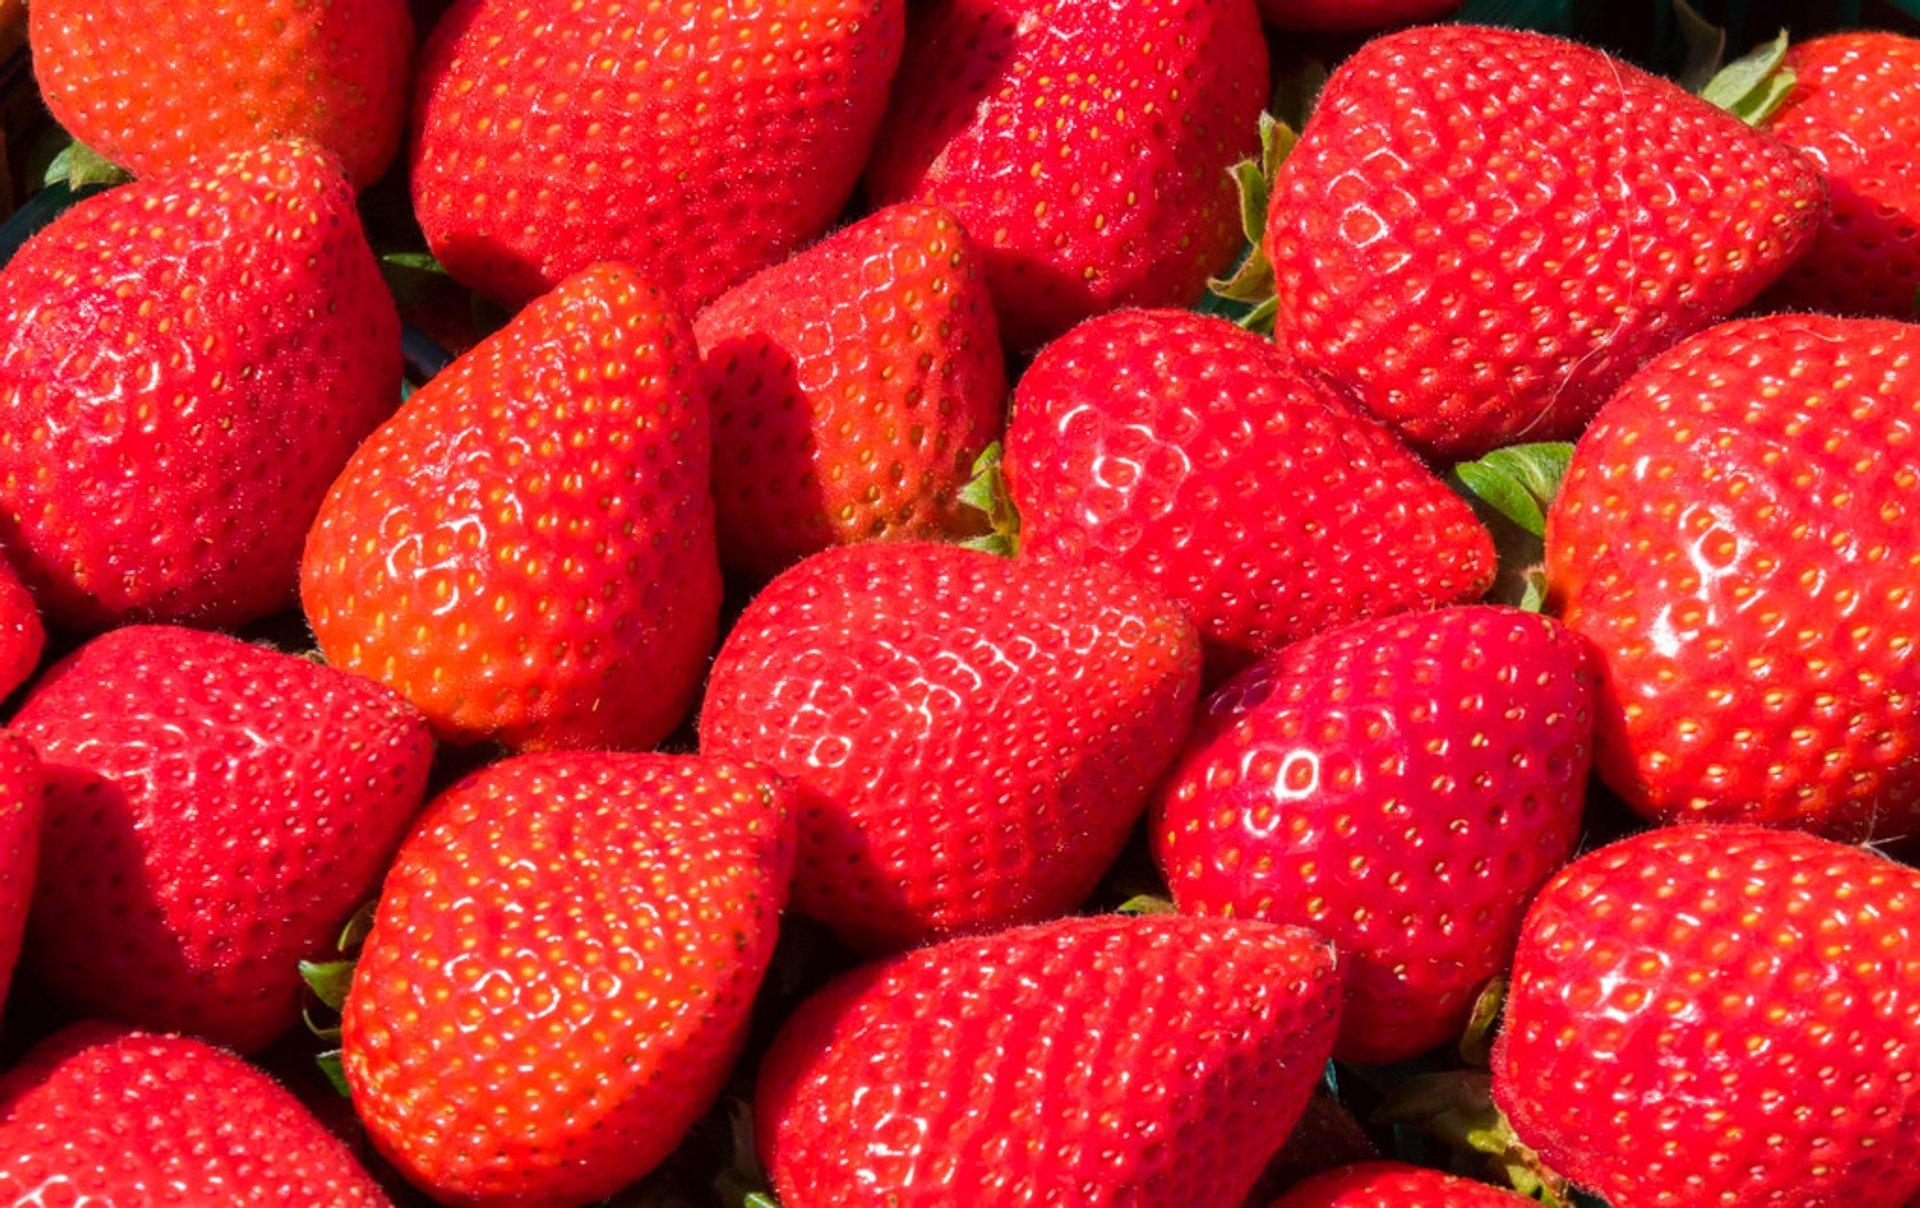 California Strawberry Festival in California 2019 - Best Time